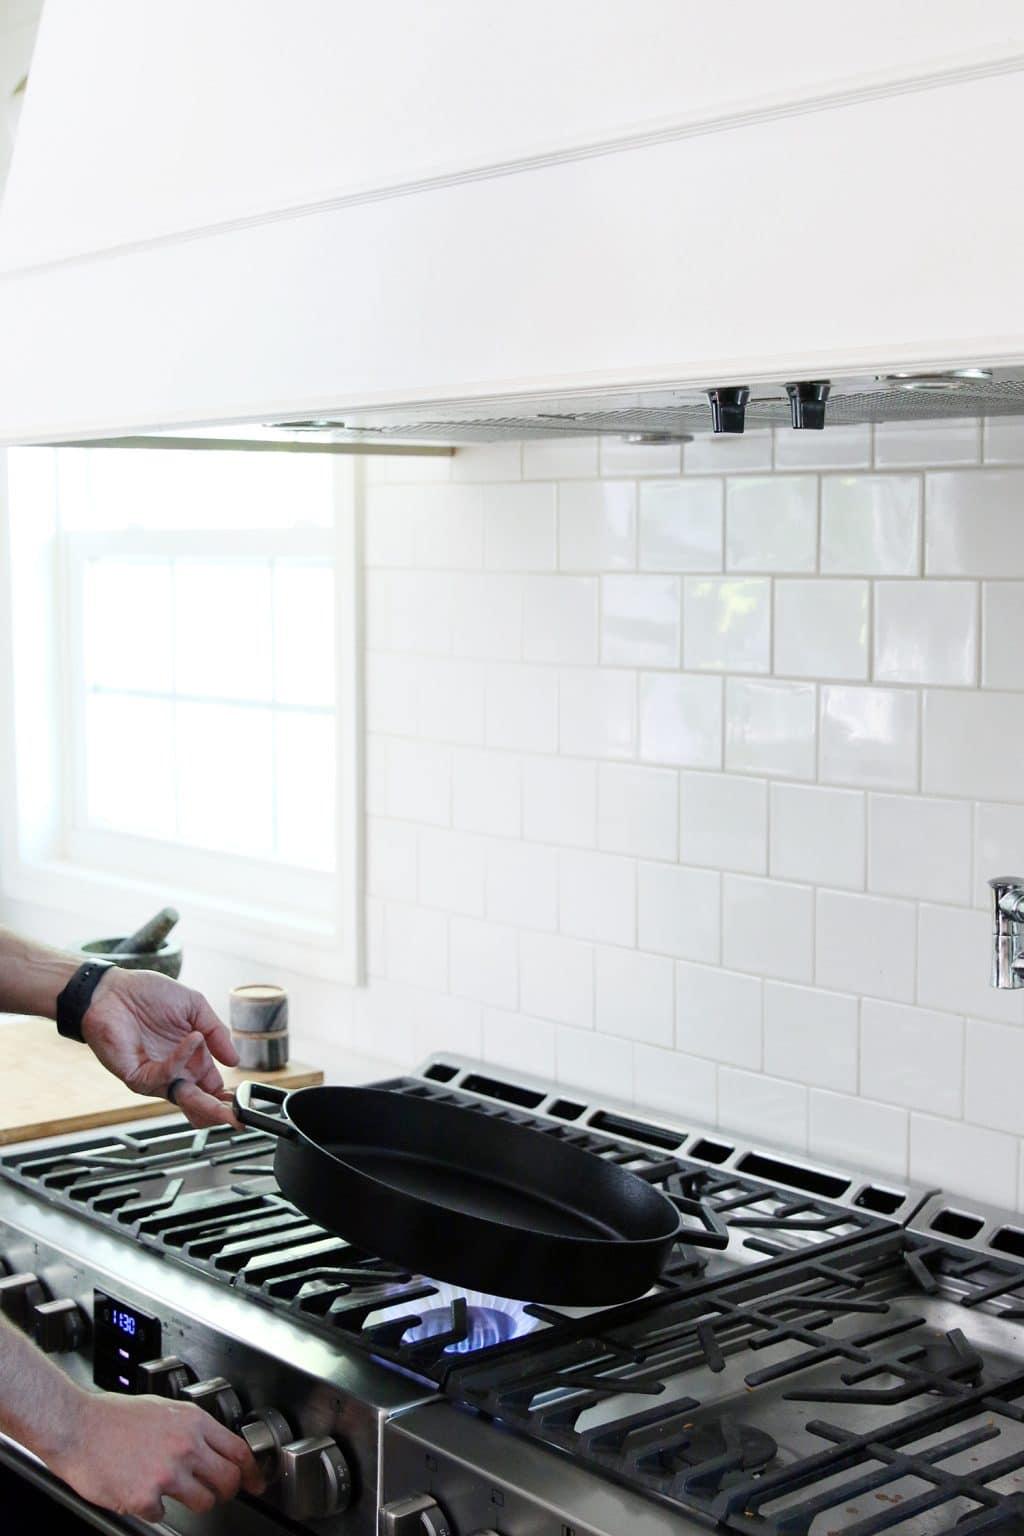 Artisanal Kitchen Supply 14in Everyday Pan